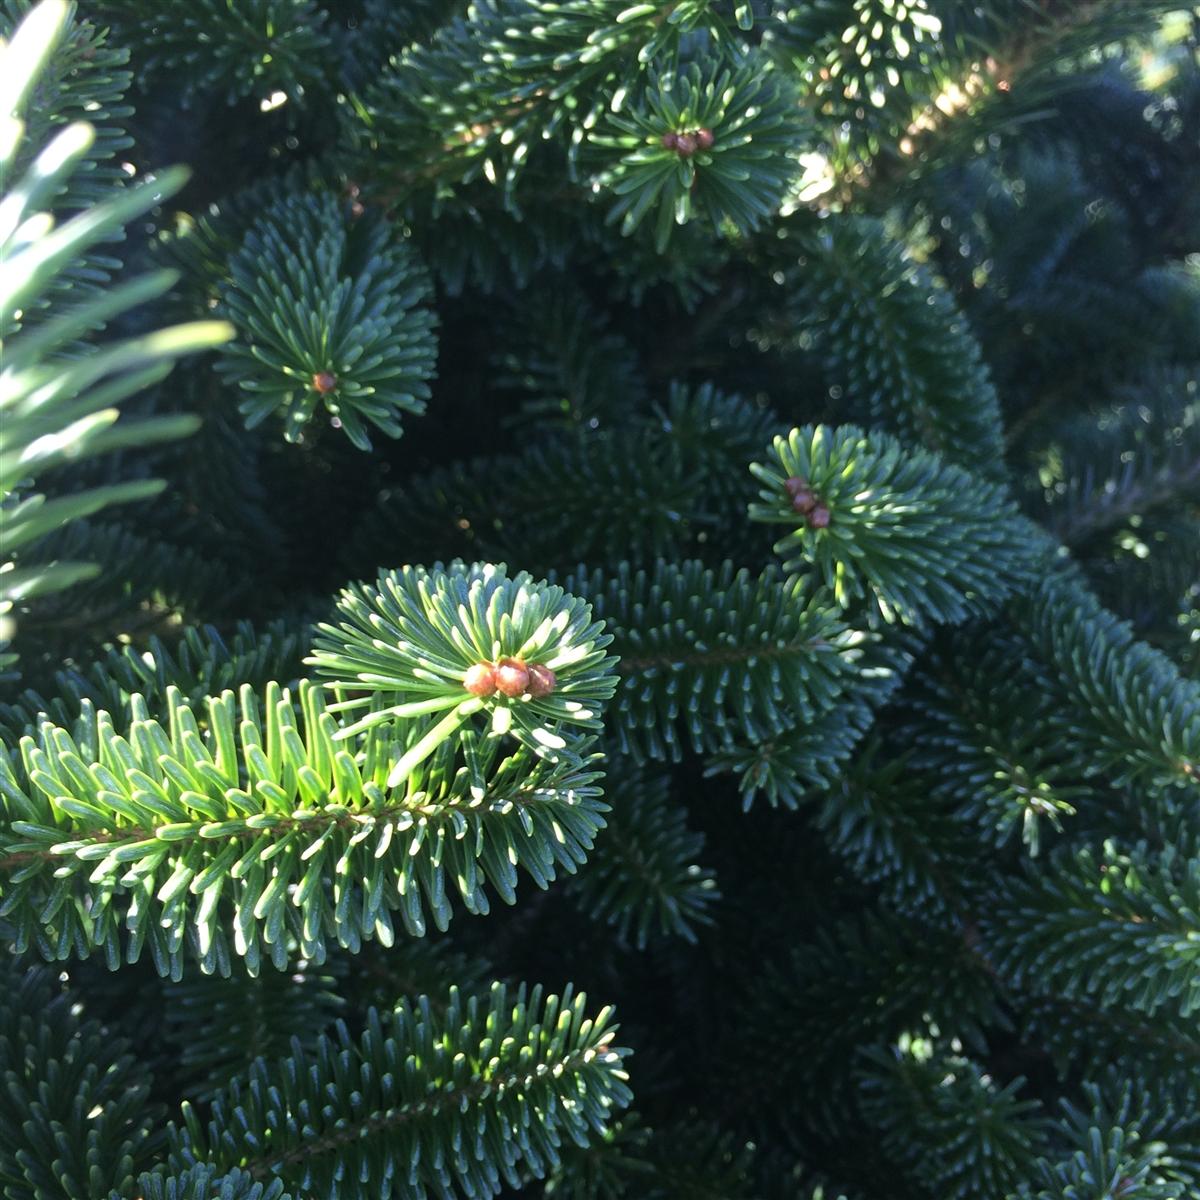 The Real Christmas Tree Farm: Buy A Real Christmas Tree Online